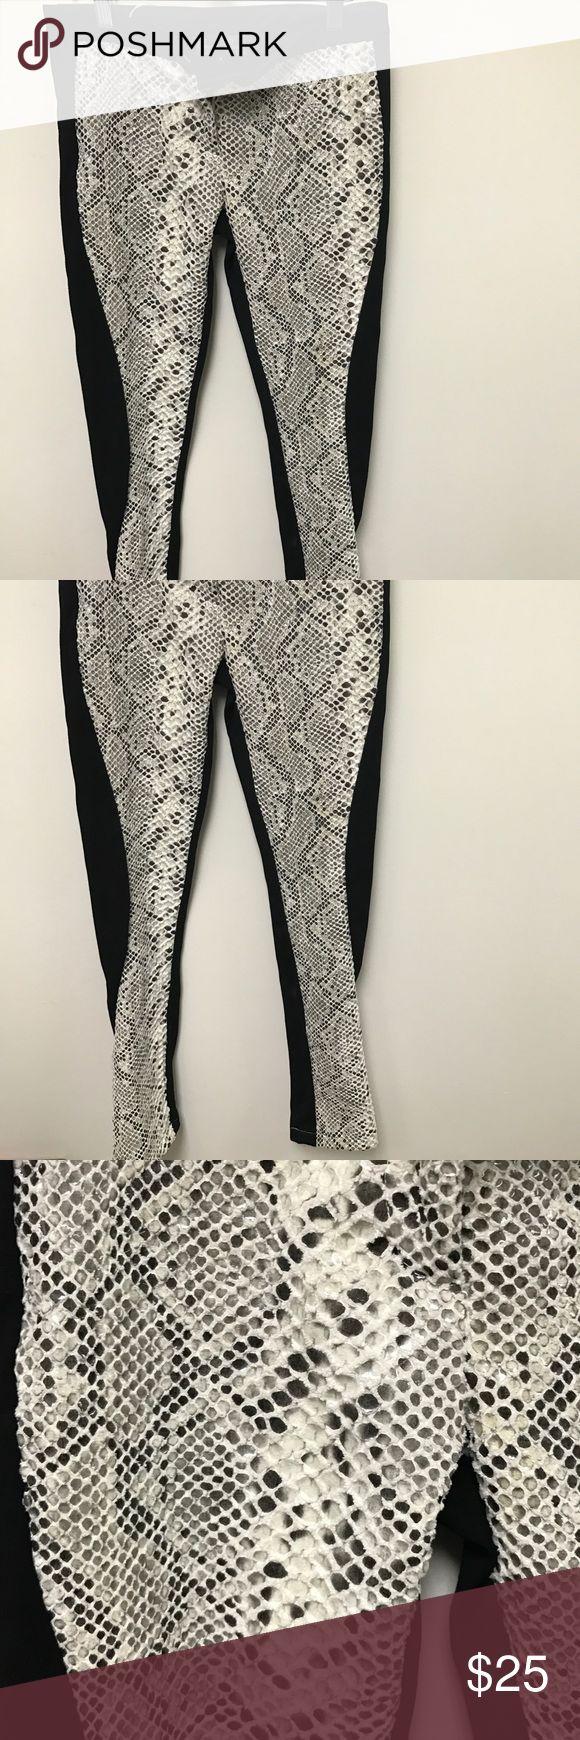 NWT Emma Lang Couture Snake print pants SexyWhite/black snake print pants NEW! Couture, split bottom ankle... black on back... soo hot emma lang Pants Straight Leg